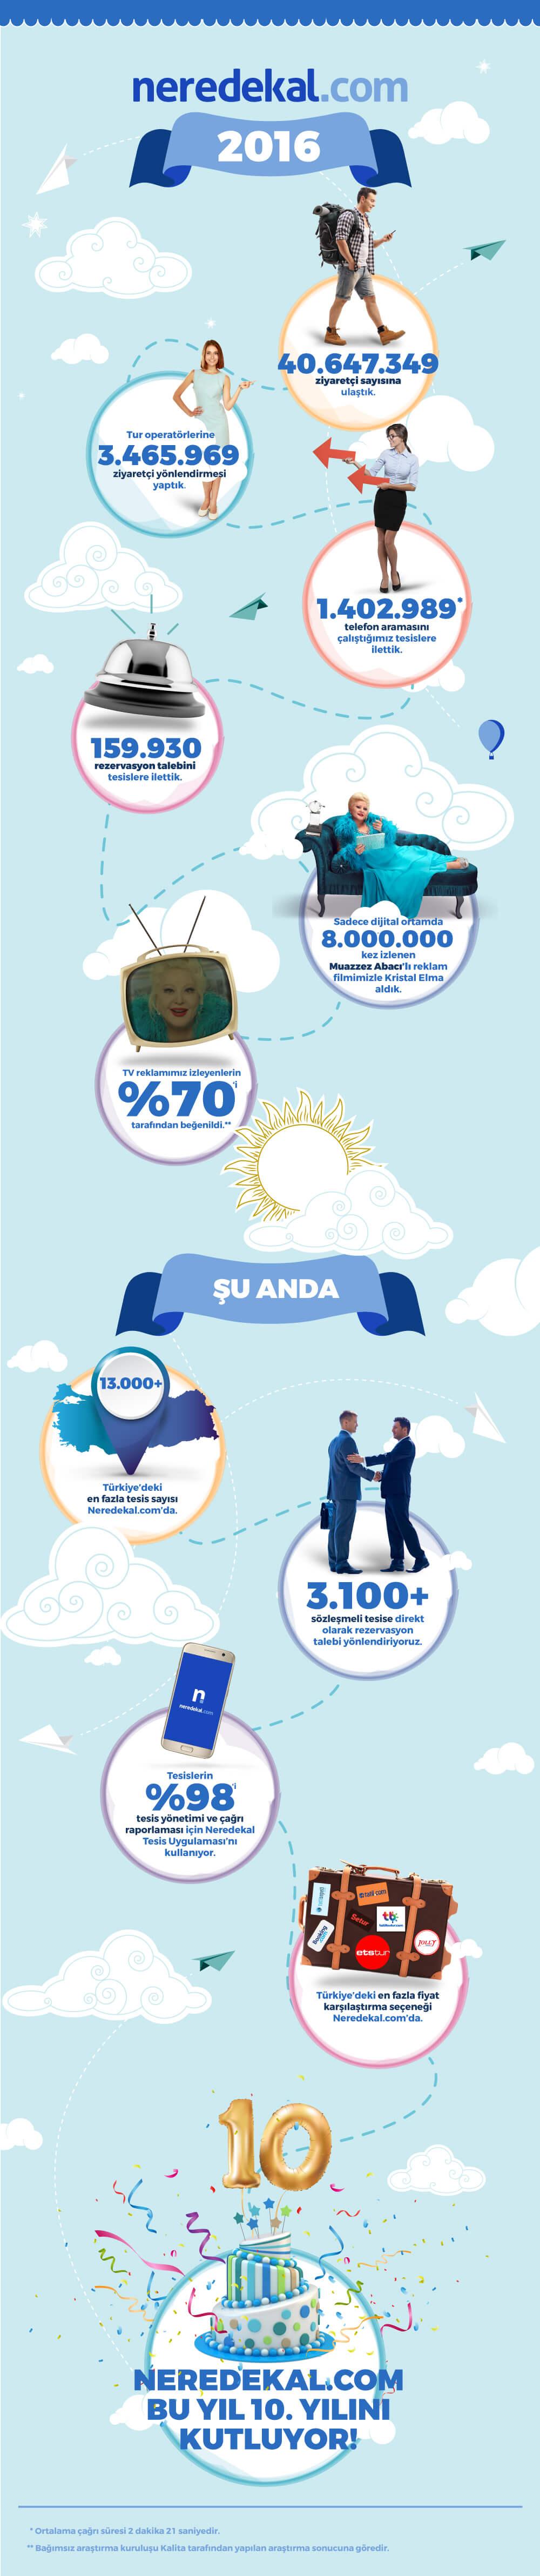 neredekal-2016-infografi (1)